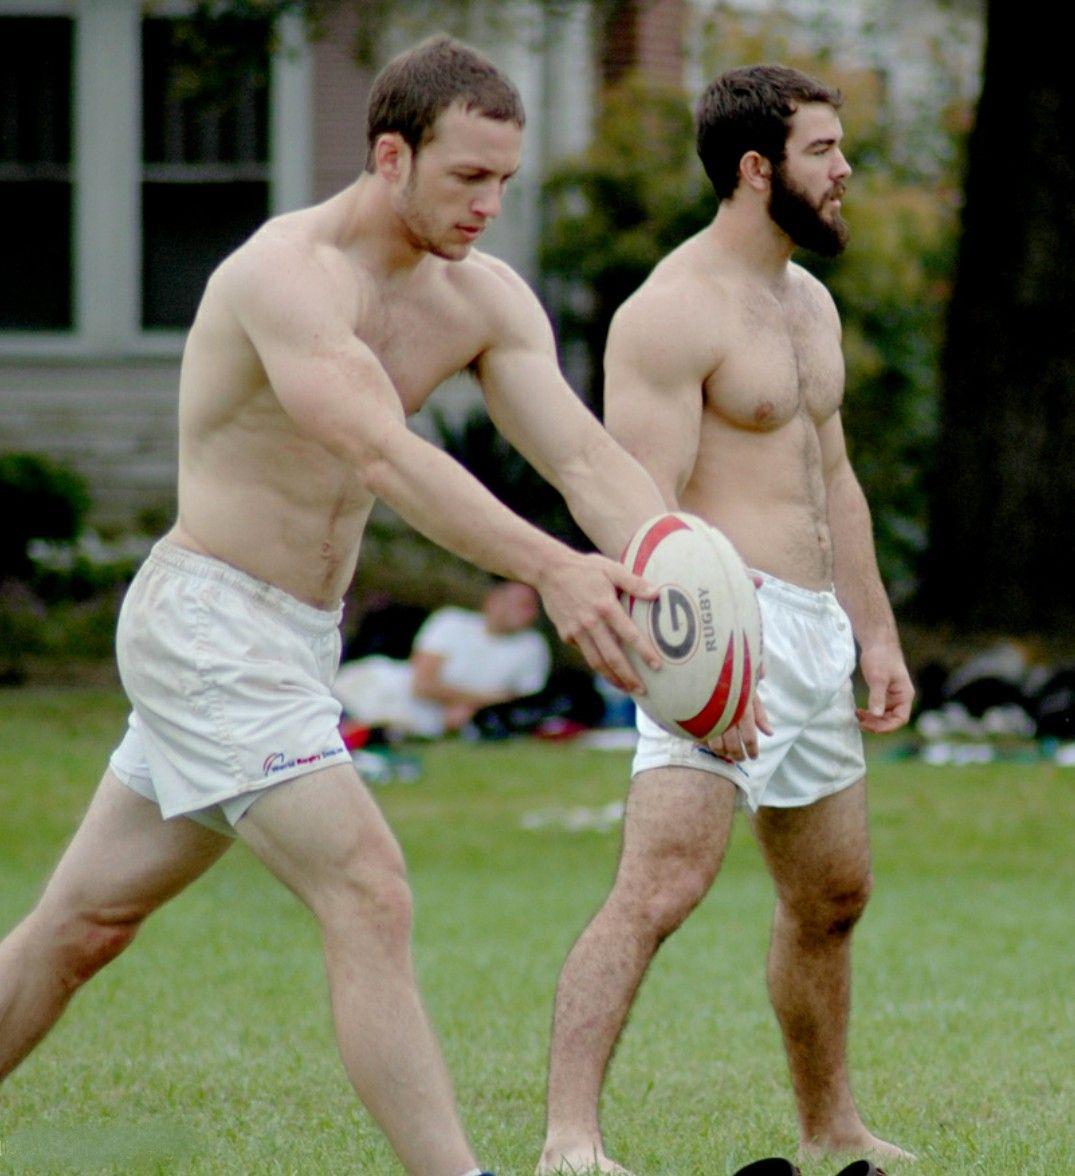 Rugby Australia Responds To Israel Folau's Latest Homophobic Social Media Posts